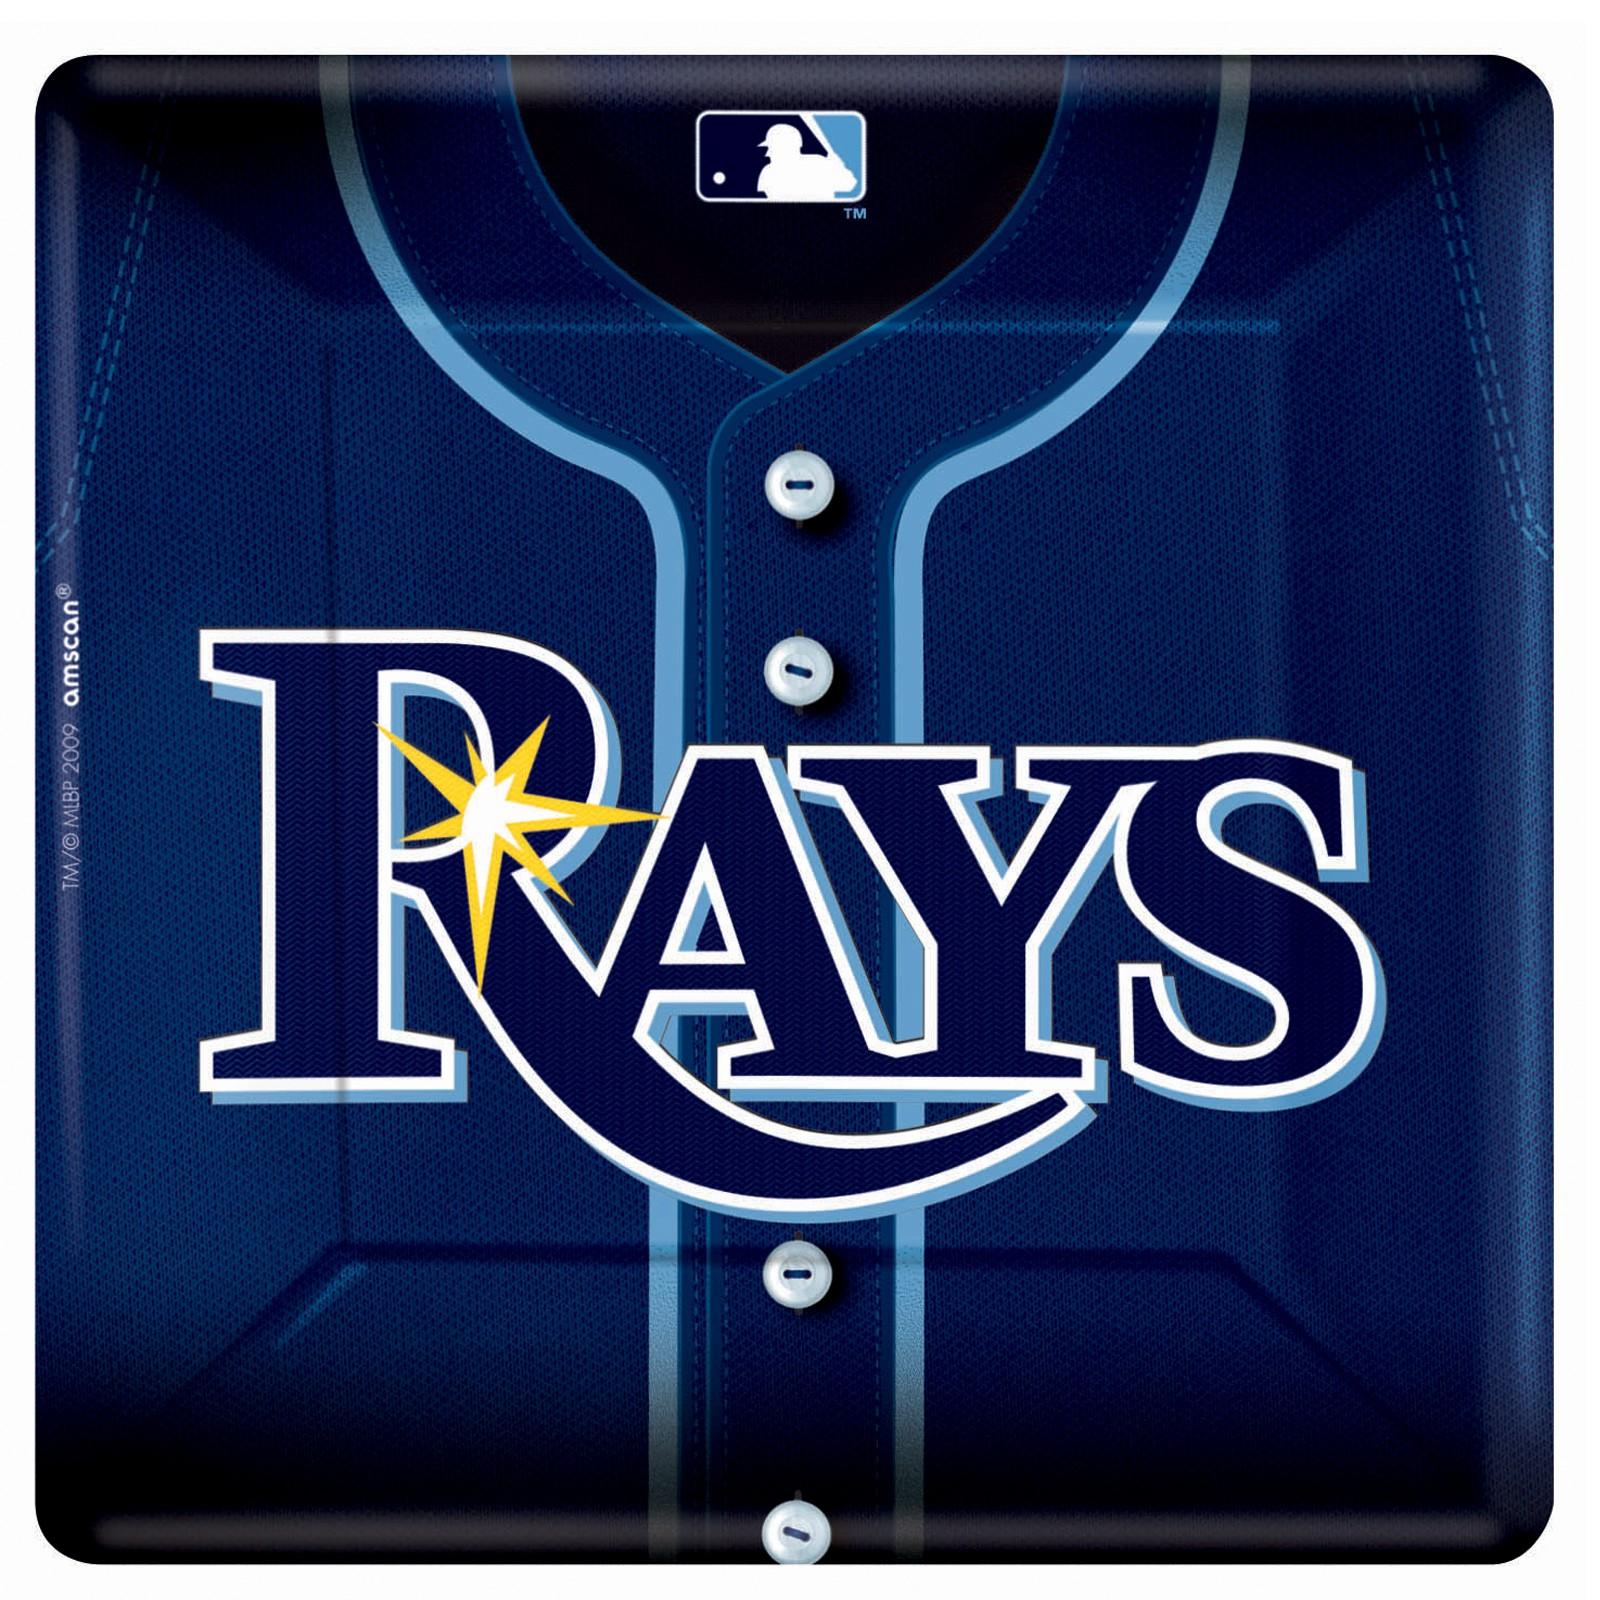 TAMPA BAY RAYS baseball mlb h wallpaper 1600x1600 159597 1600x1600